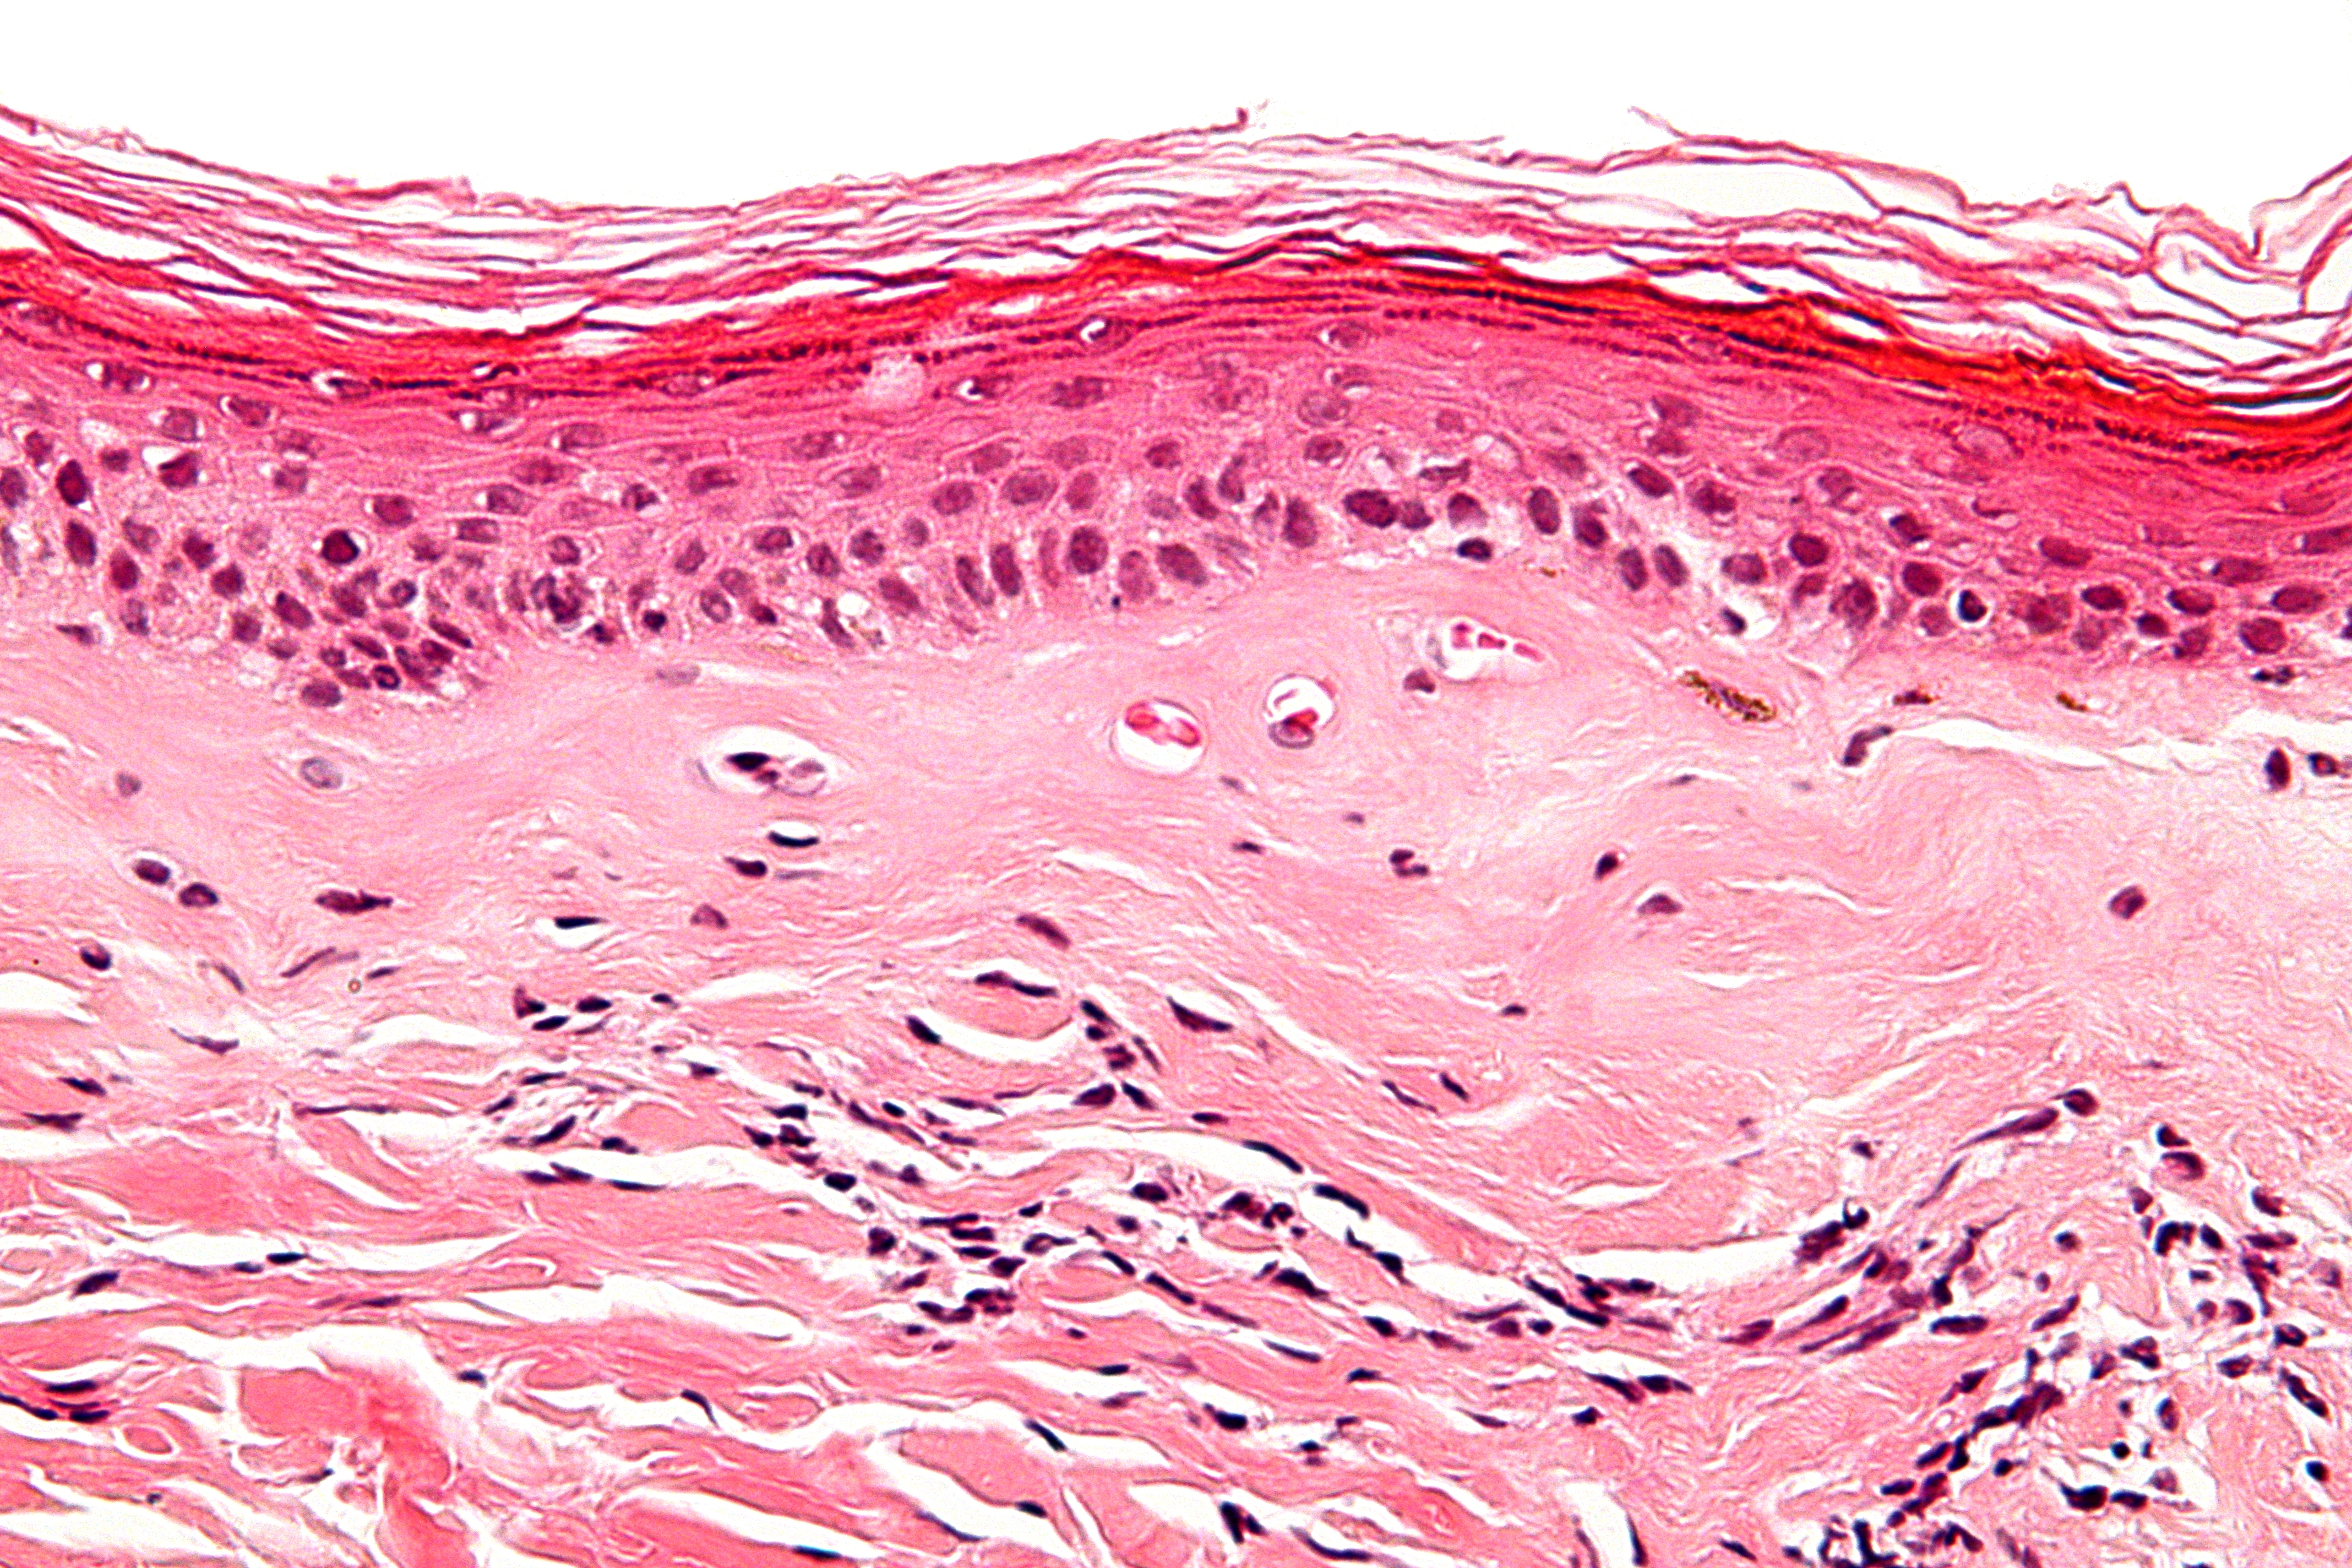 STACIE: Penis multiple sclerosis